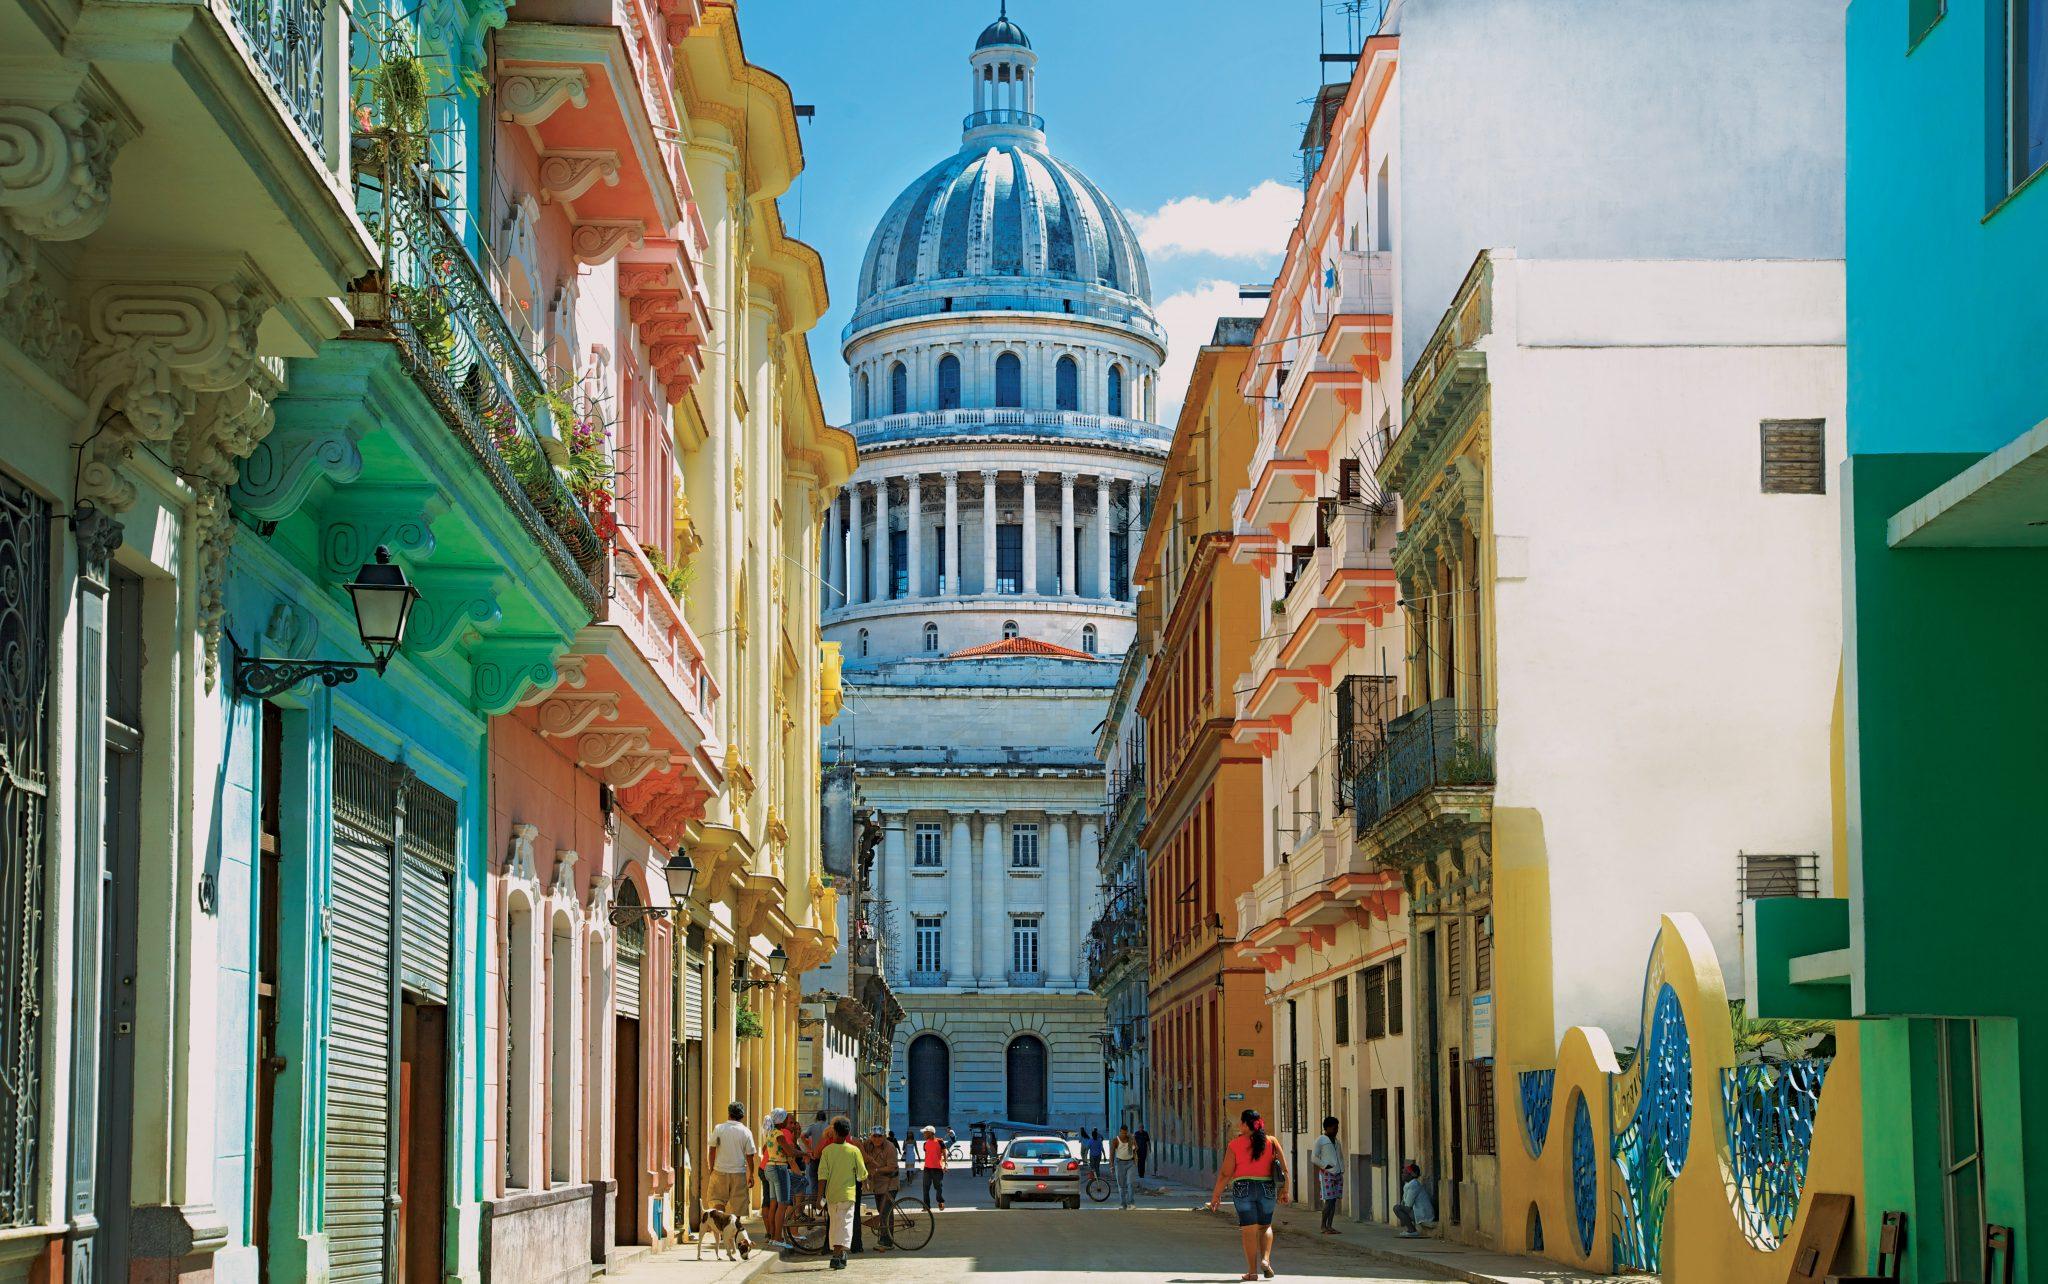 coloured-buildings_capitolio_havana_0040a2